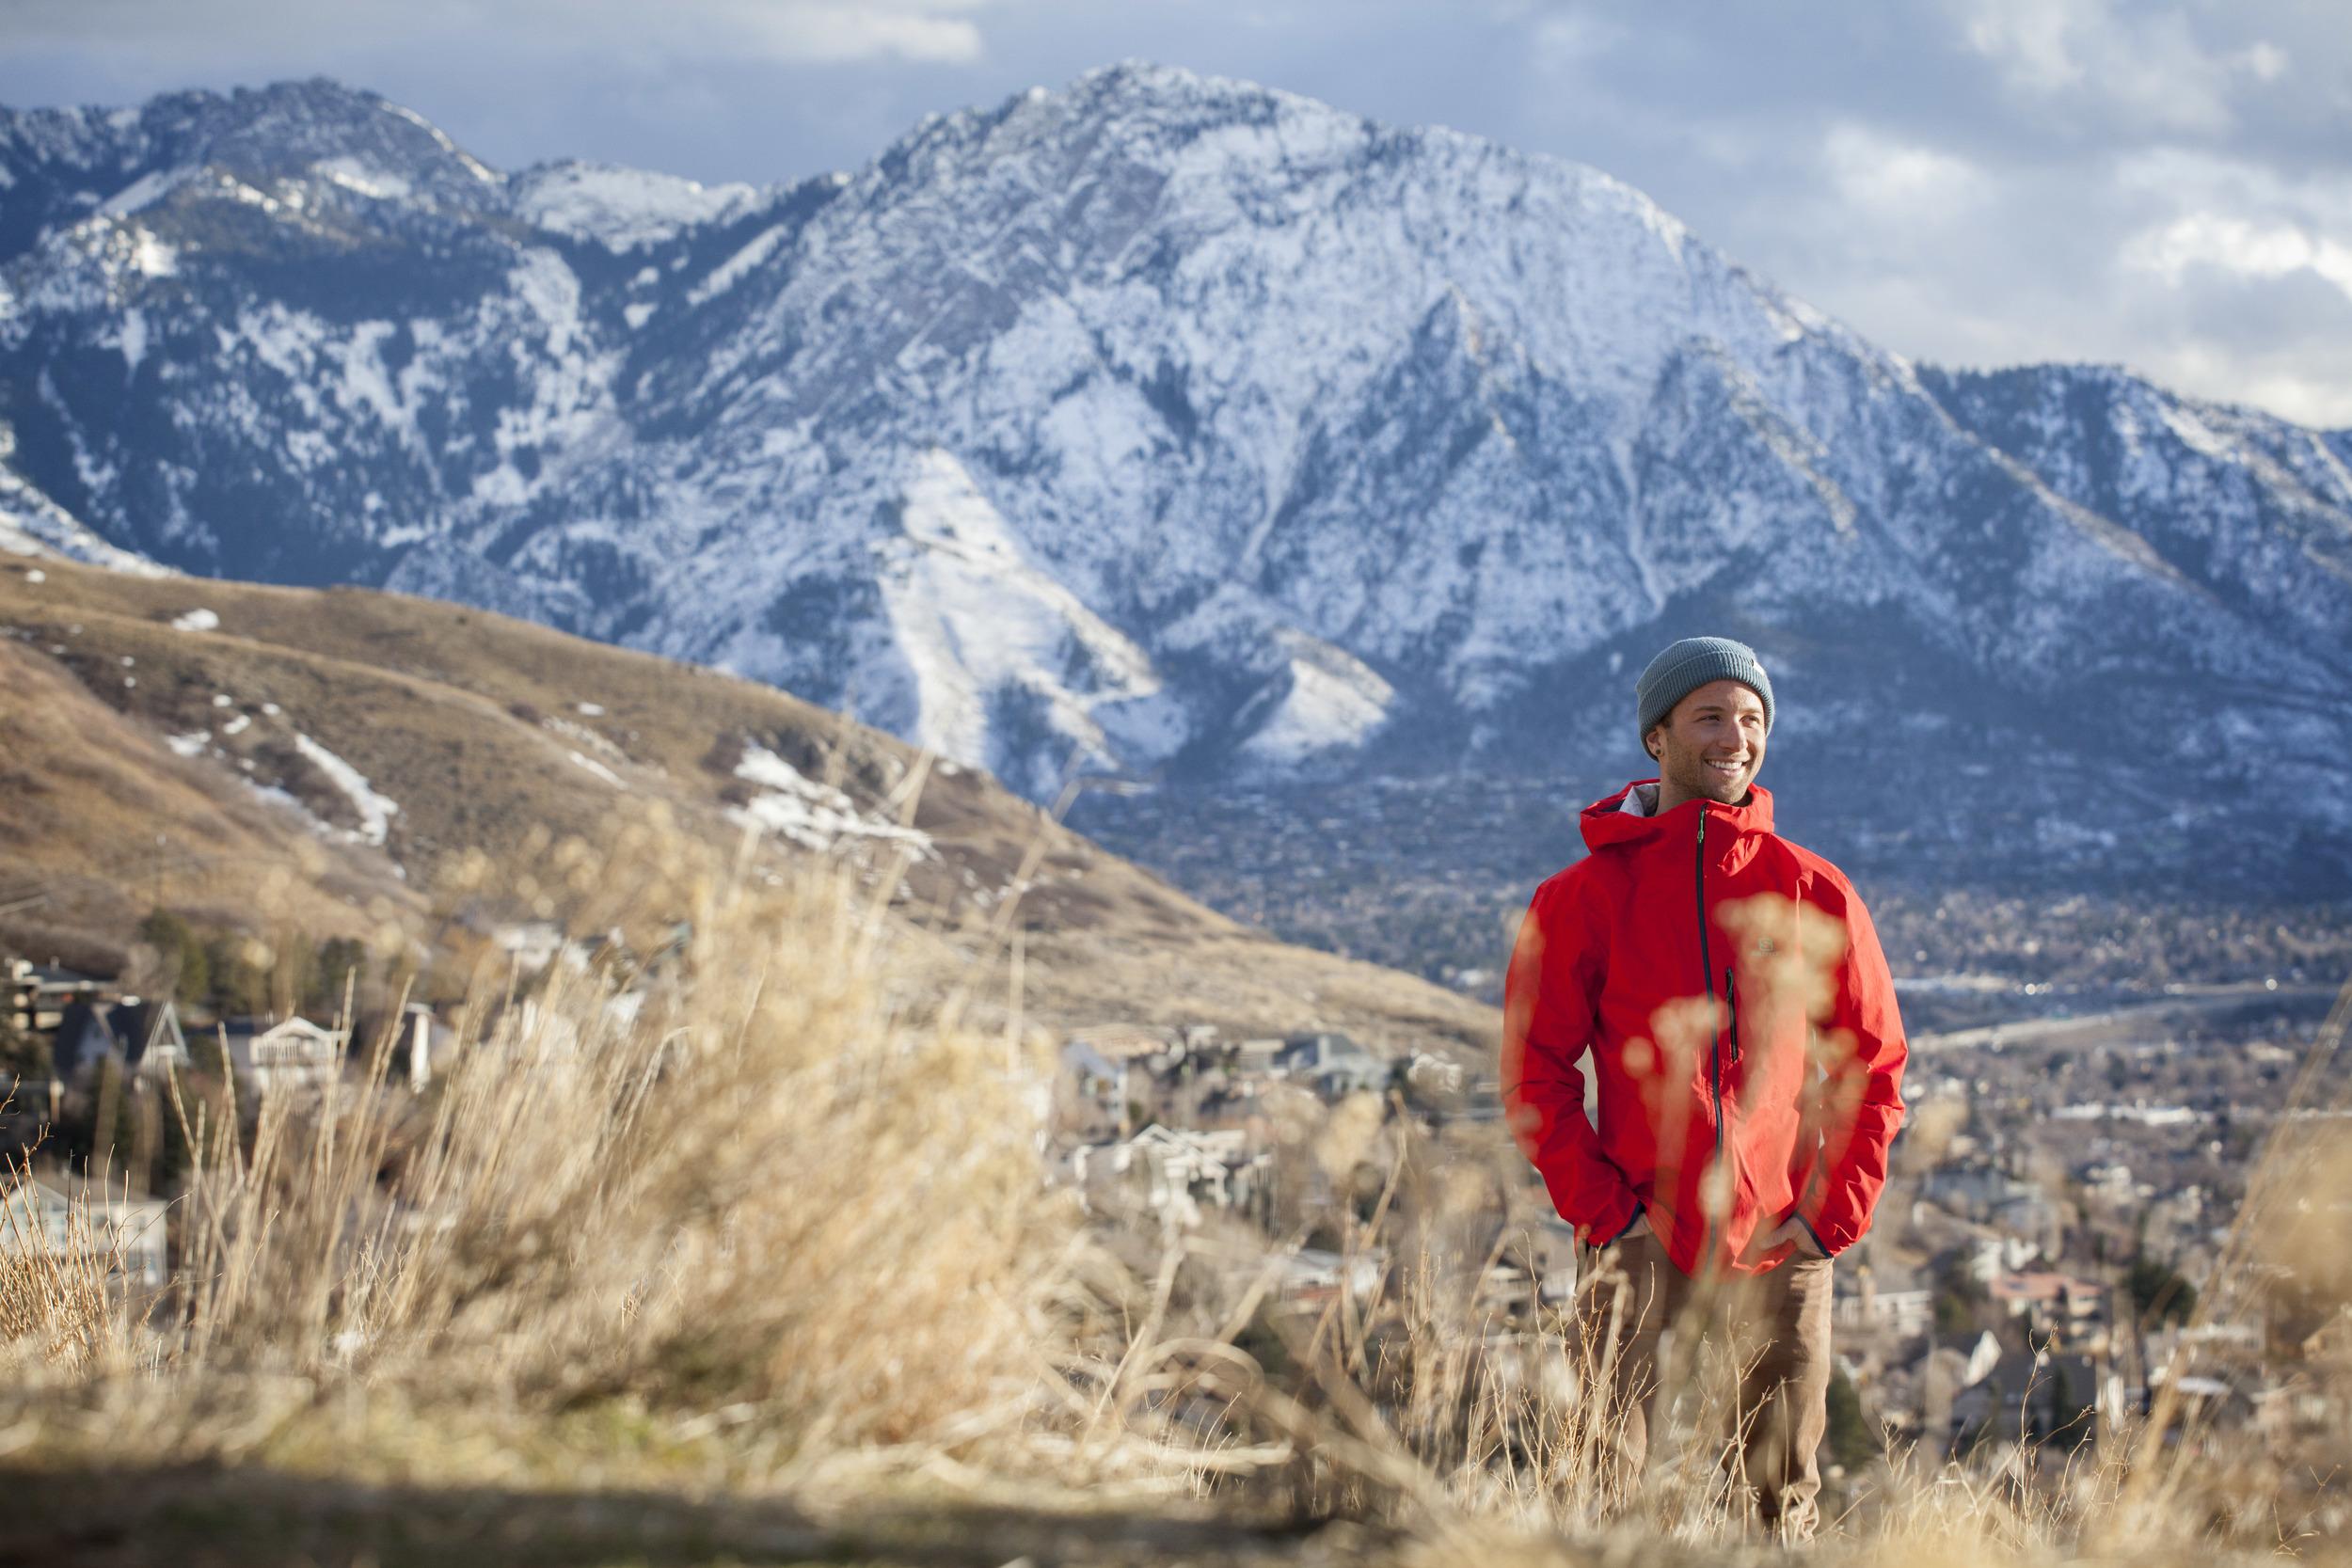 photo  Tim Jones  location  Salt Lake City, Utah